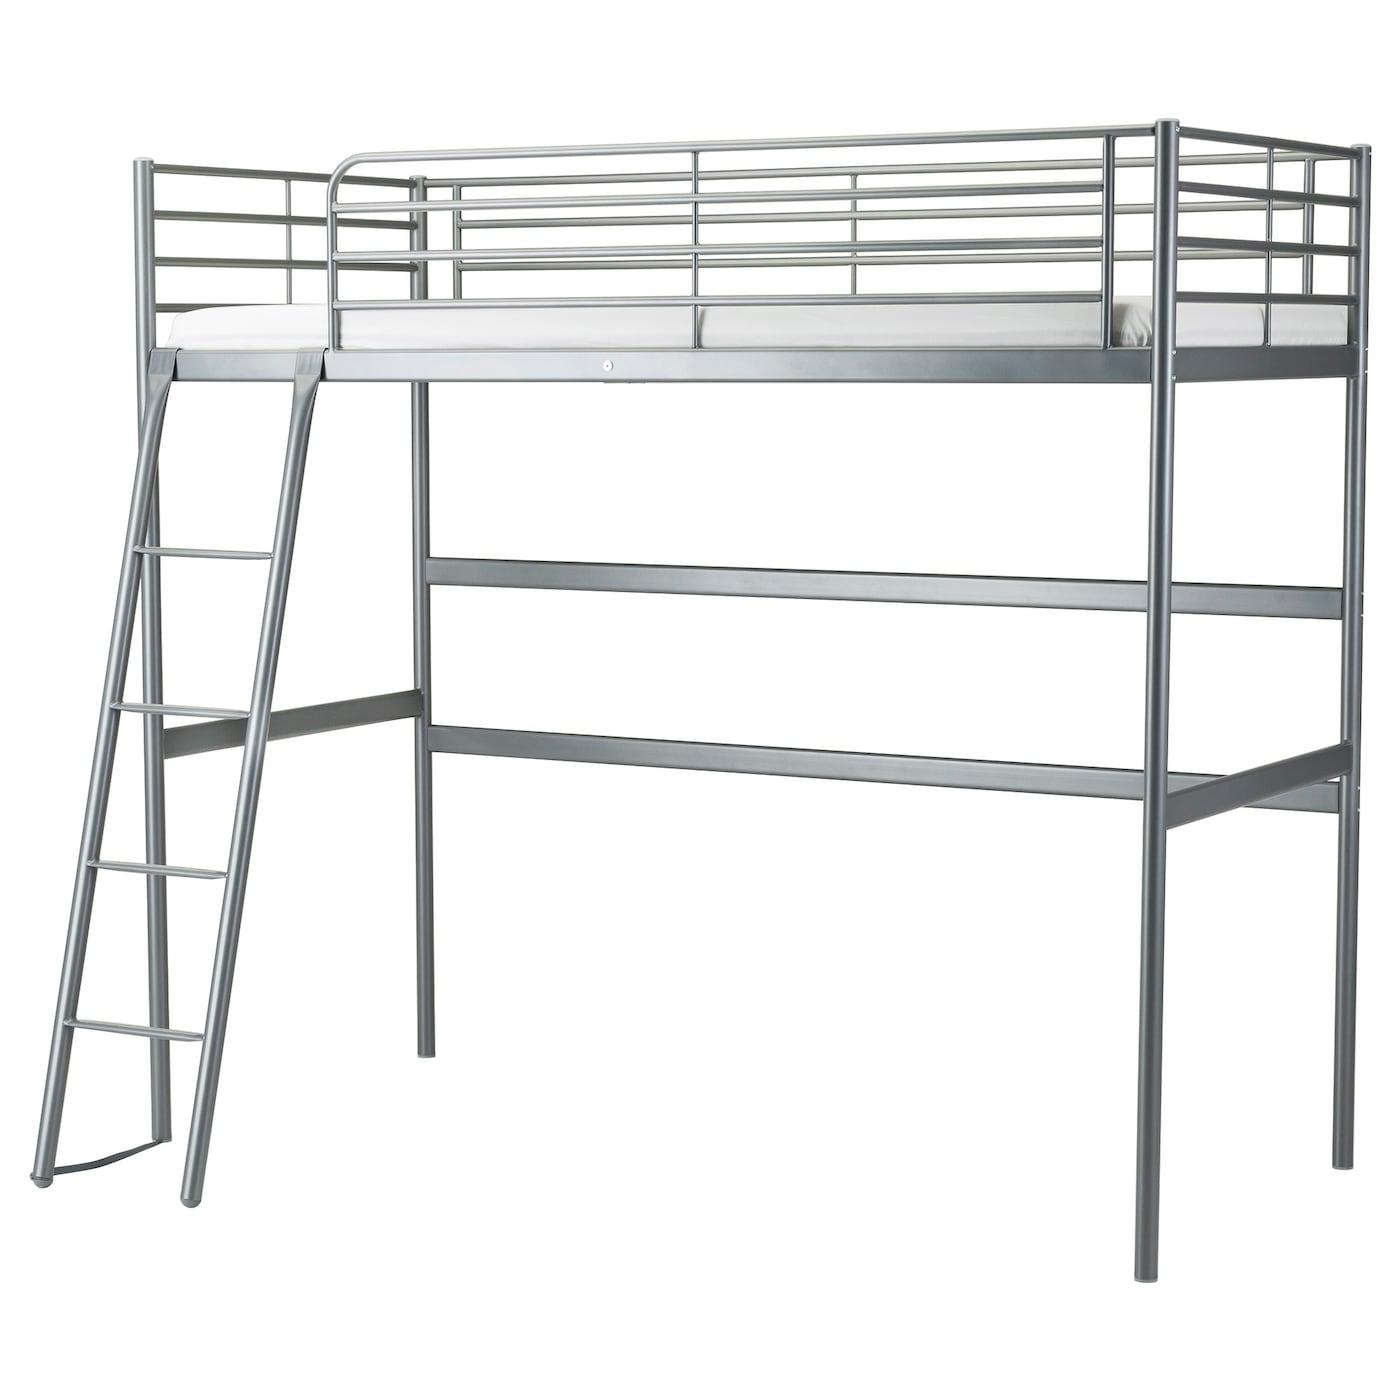 bedden matrassen ikea. Black Bedroom Furniture Sets. Home Design Ideas